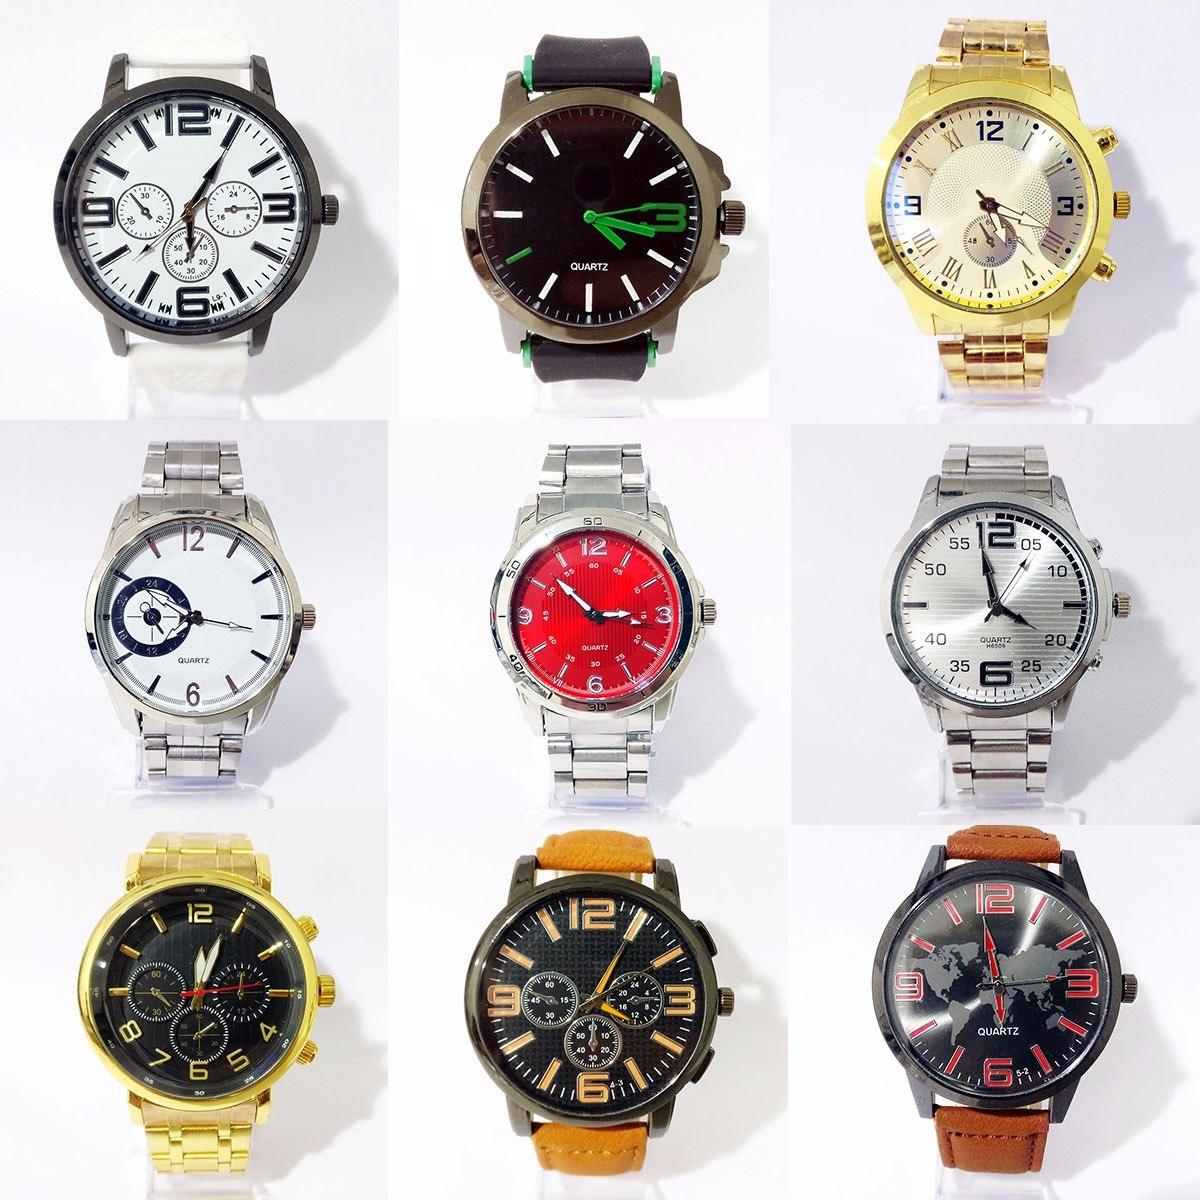 d83290977b2 kit 20 relógios masculinos grandes atacado revenda lote. Carregando zoom.